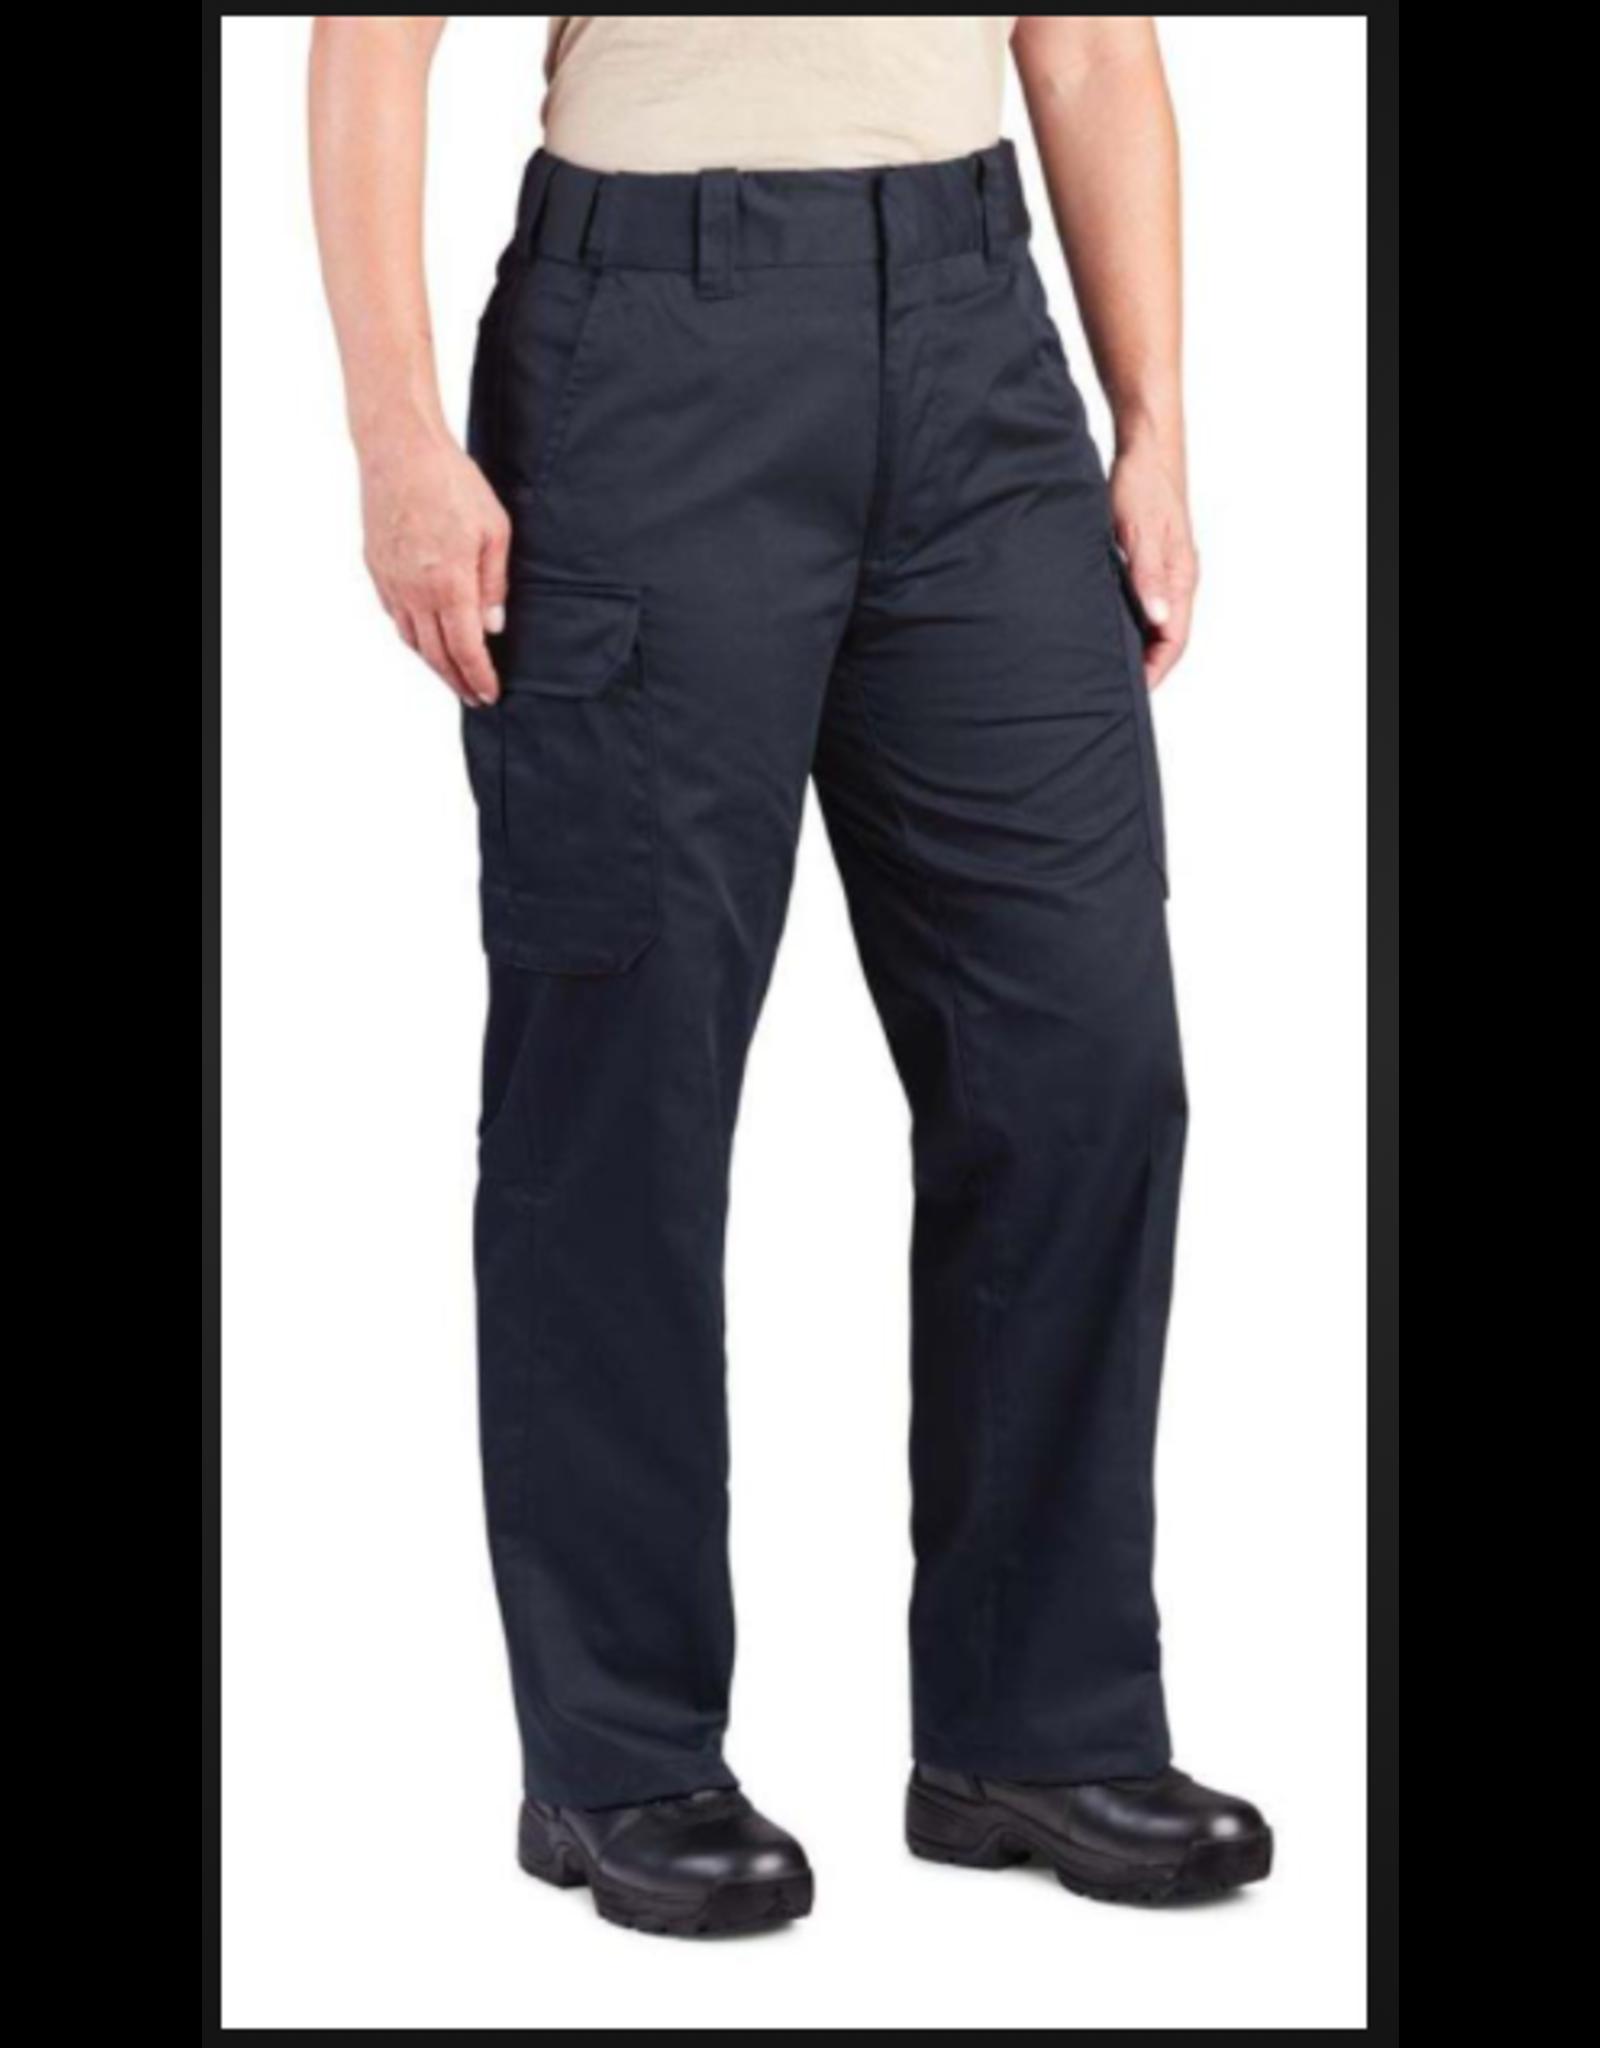 Propper Women's Cargo Pants Size 18R